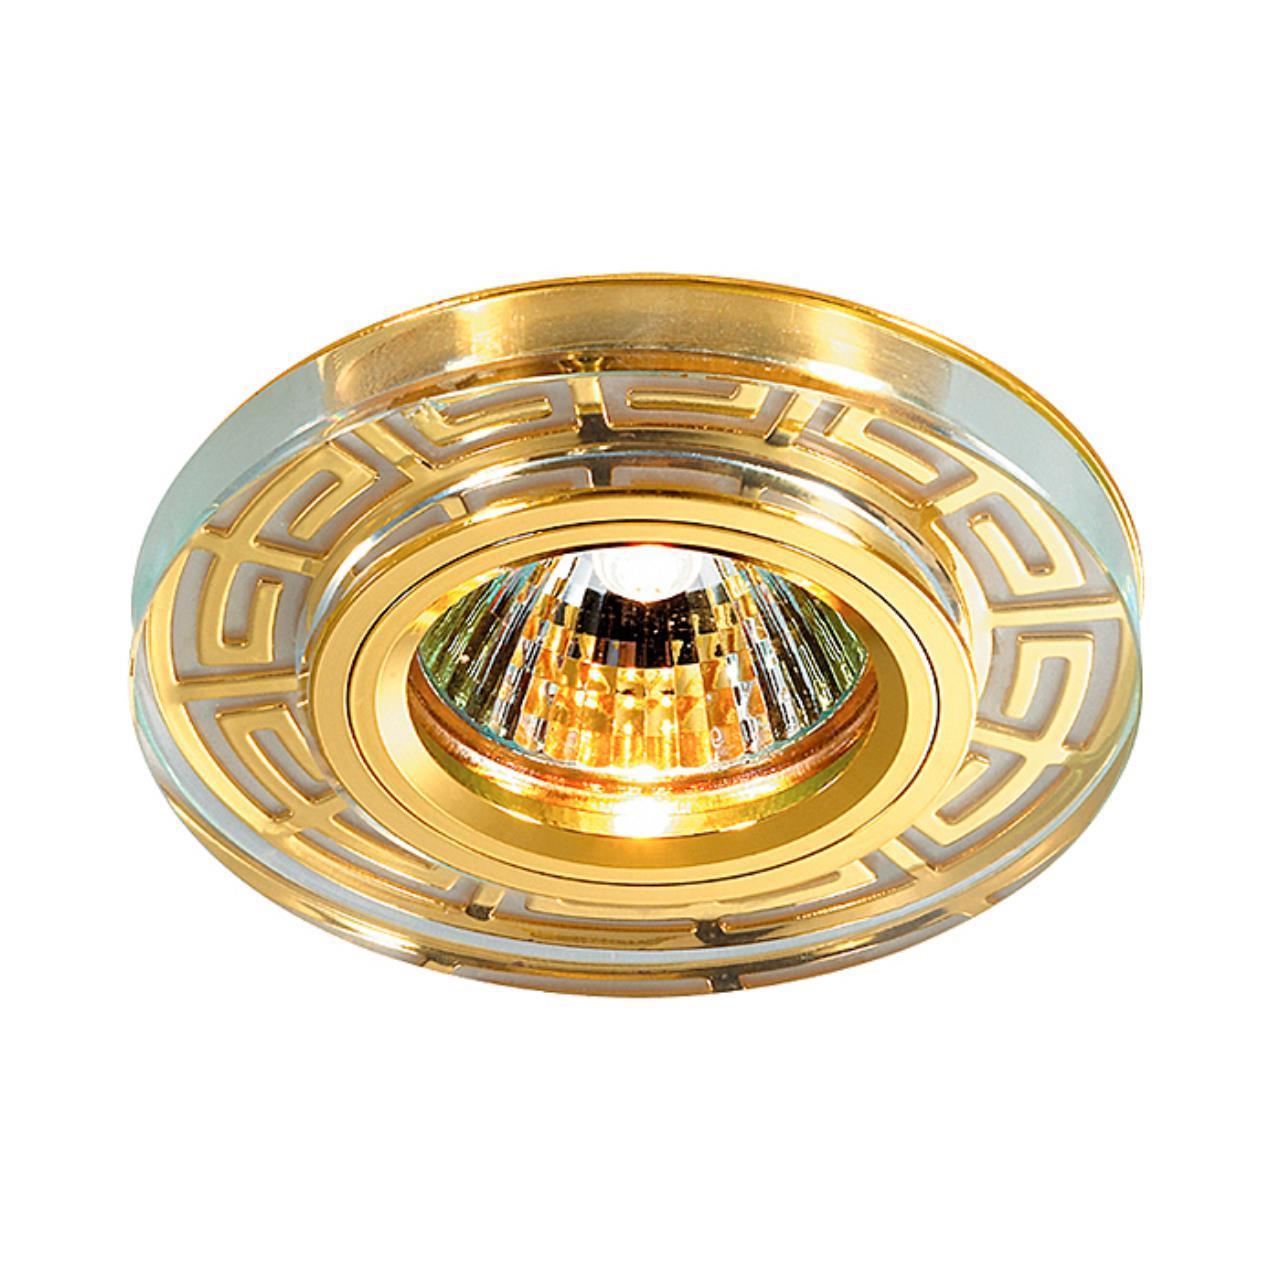 369583 SPOT NT12 127 золото Встраиваемый светильник IP20 GX5.3 50W 12V MAZE